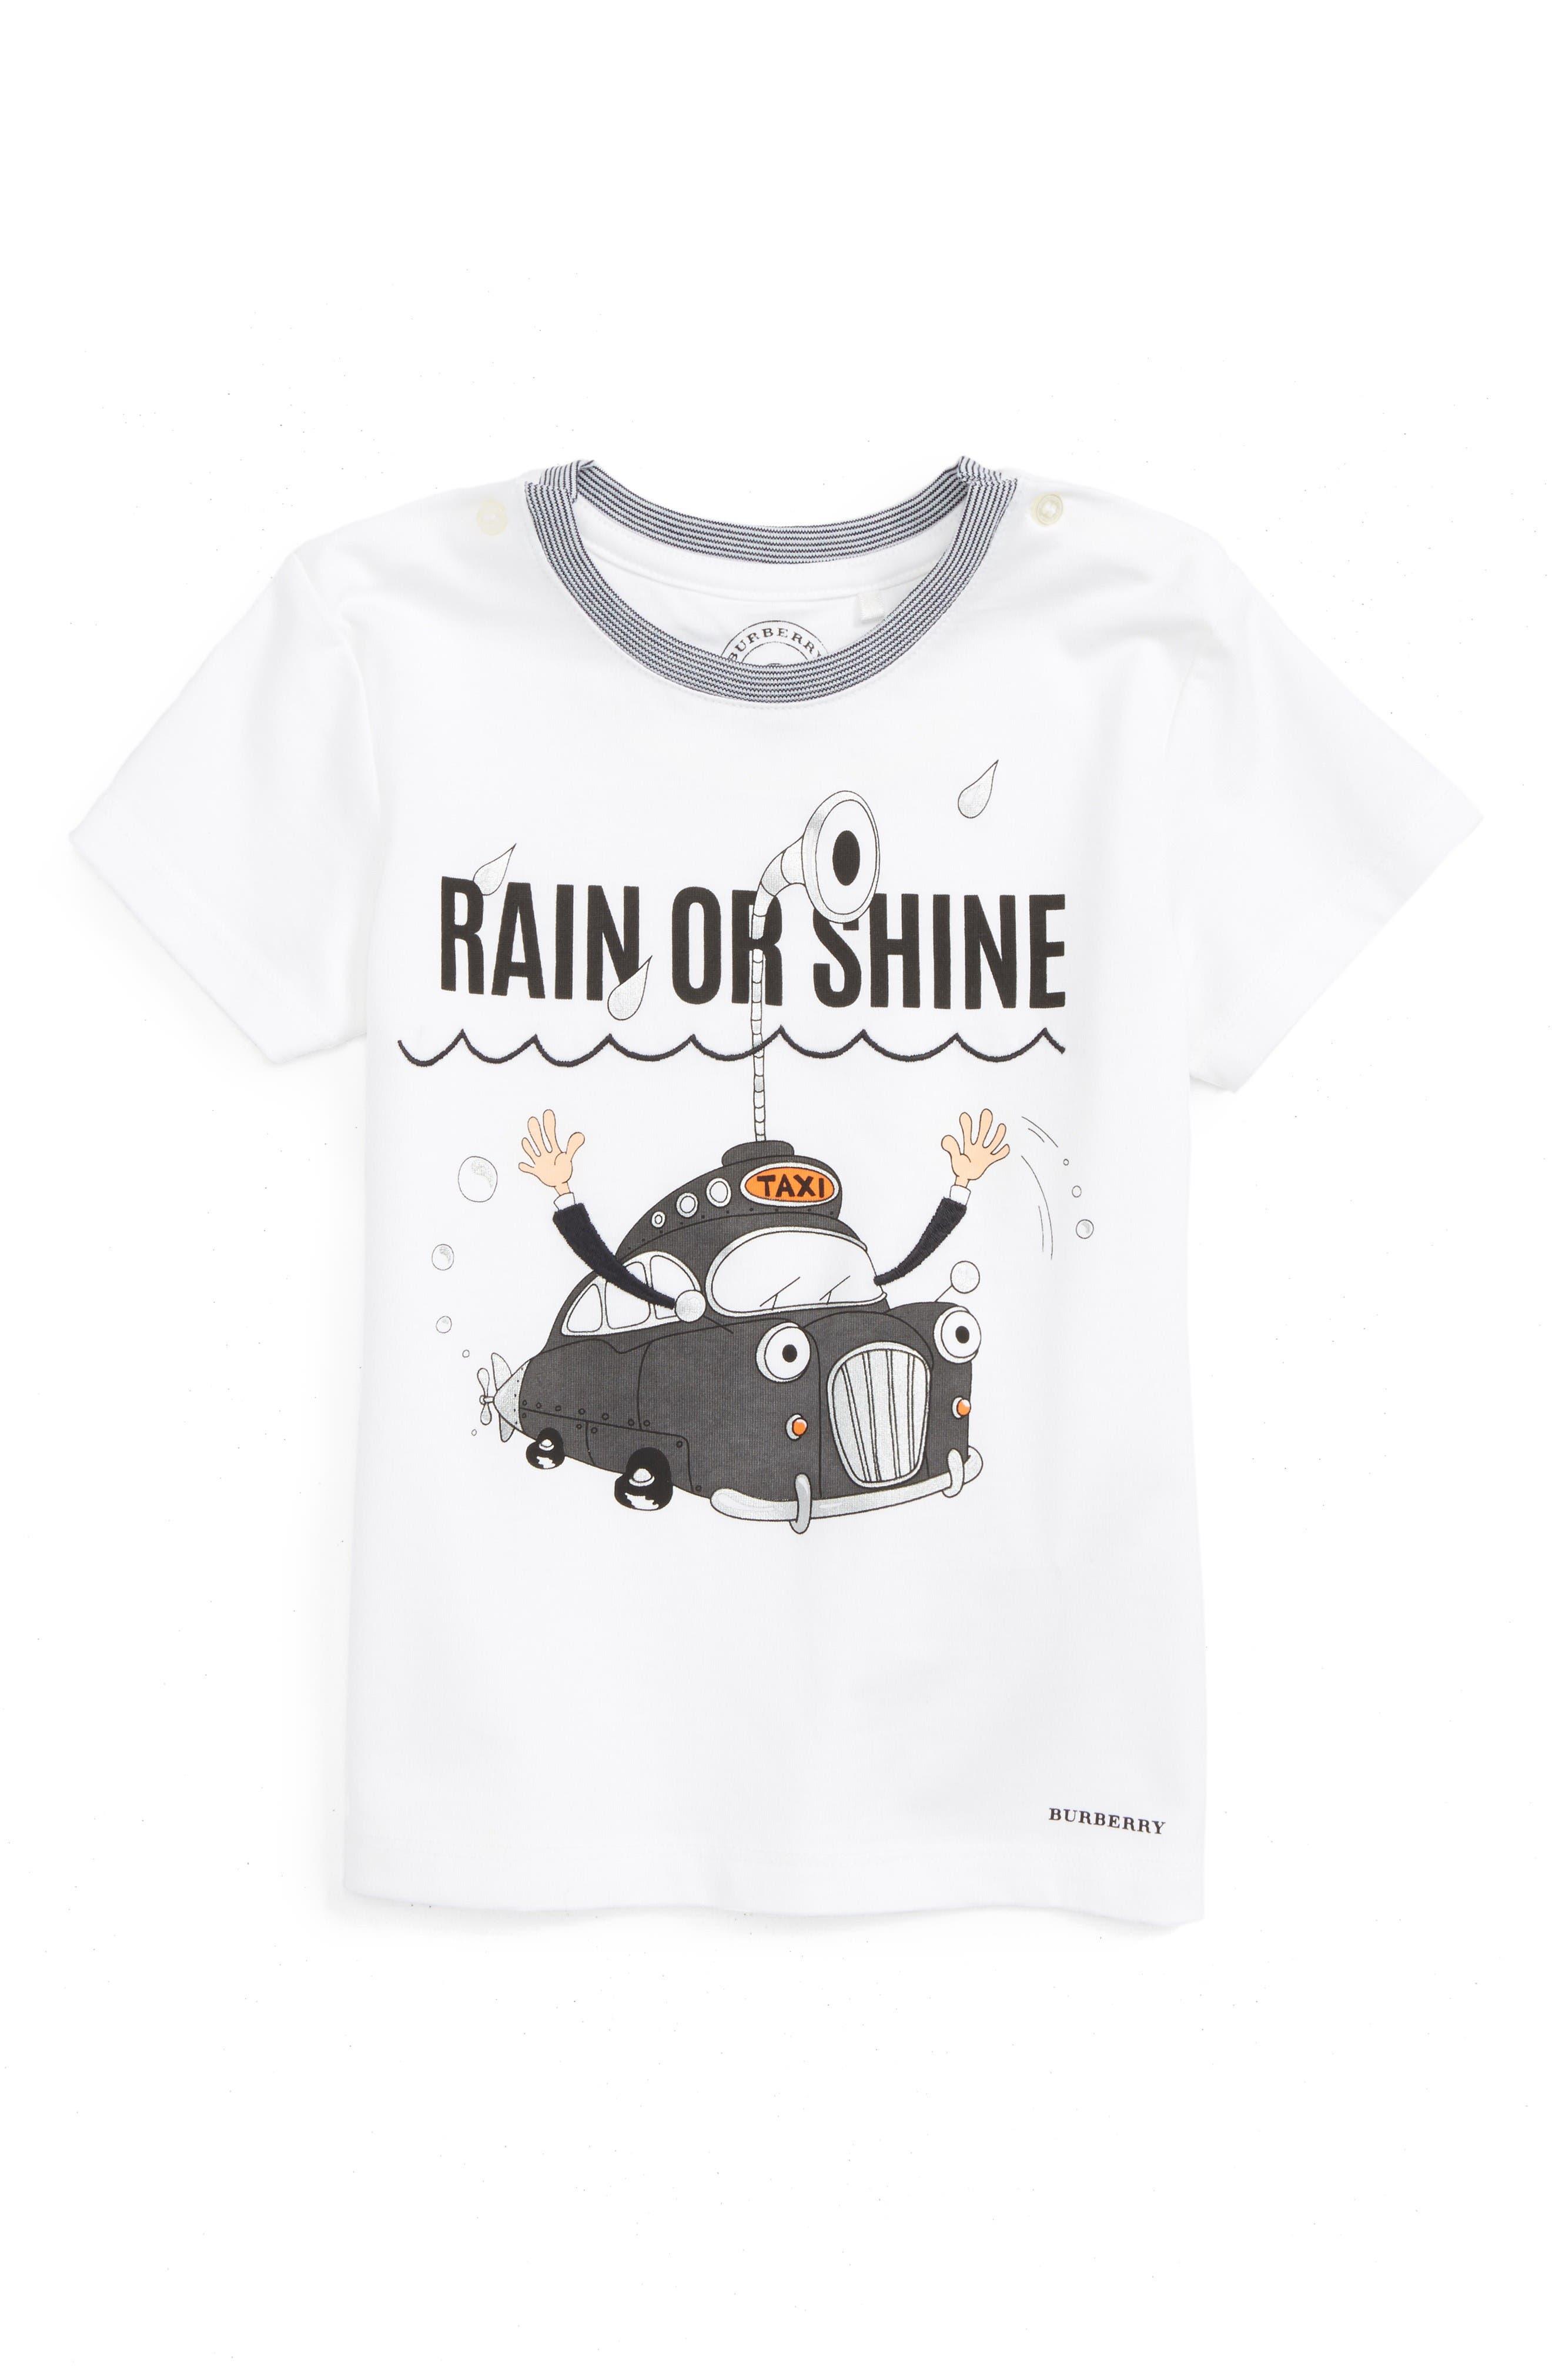 BURBERRY Rain Or Shine Graphic Shirt